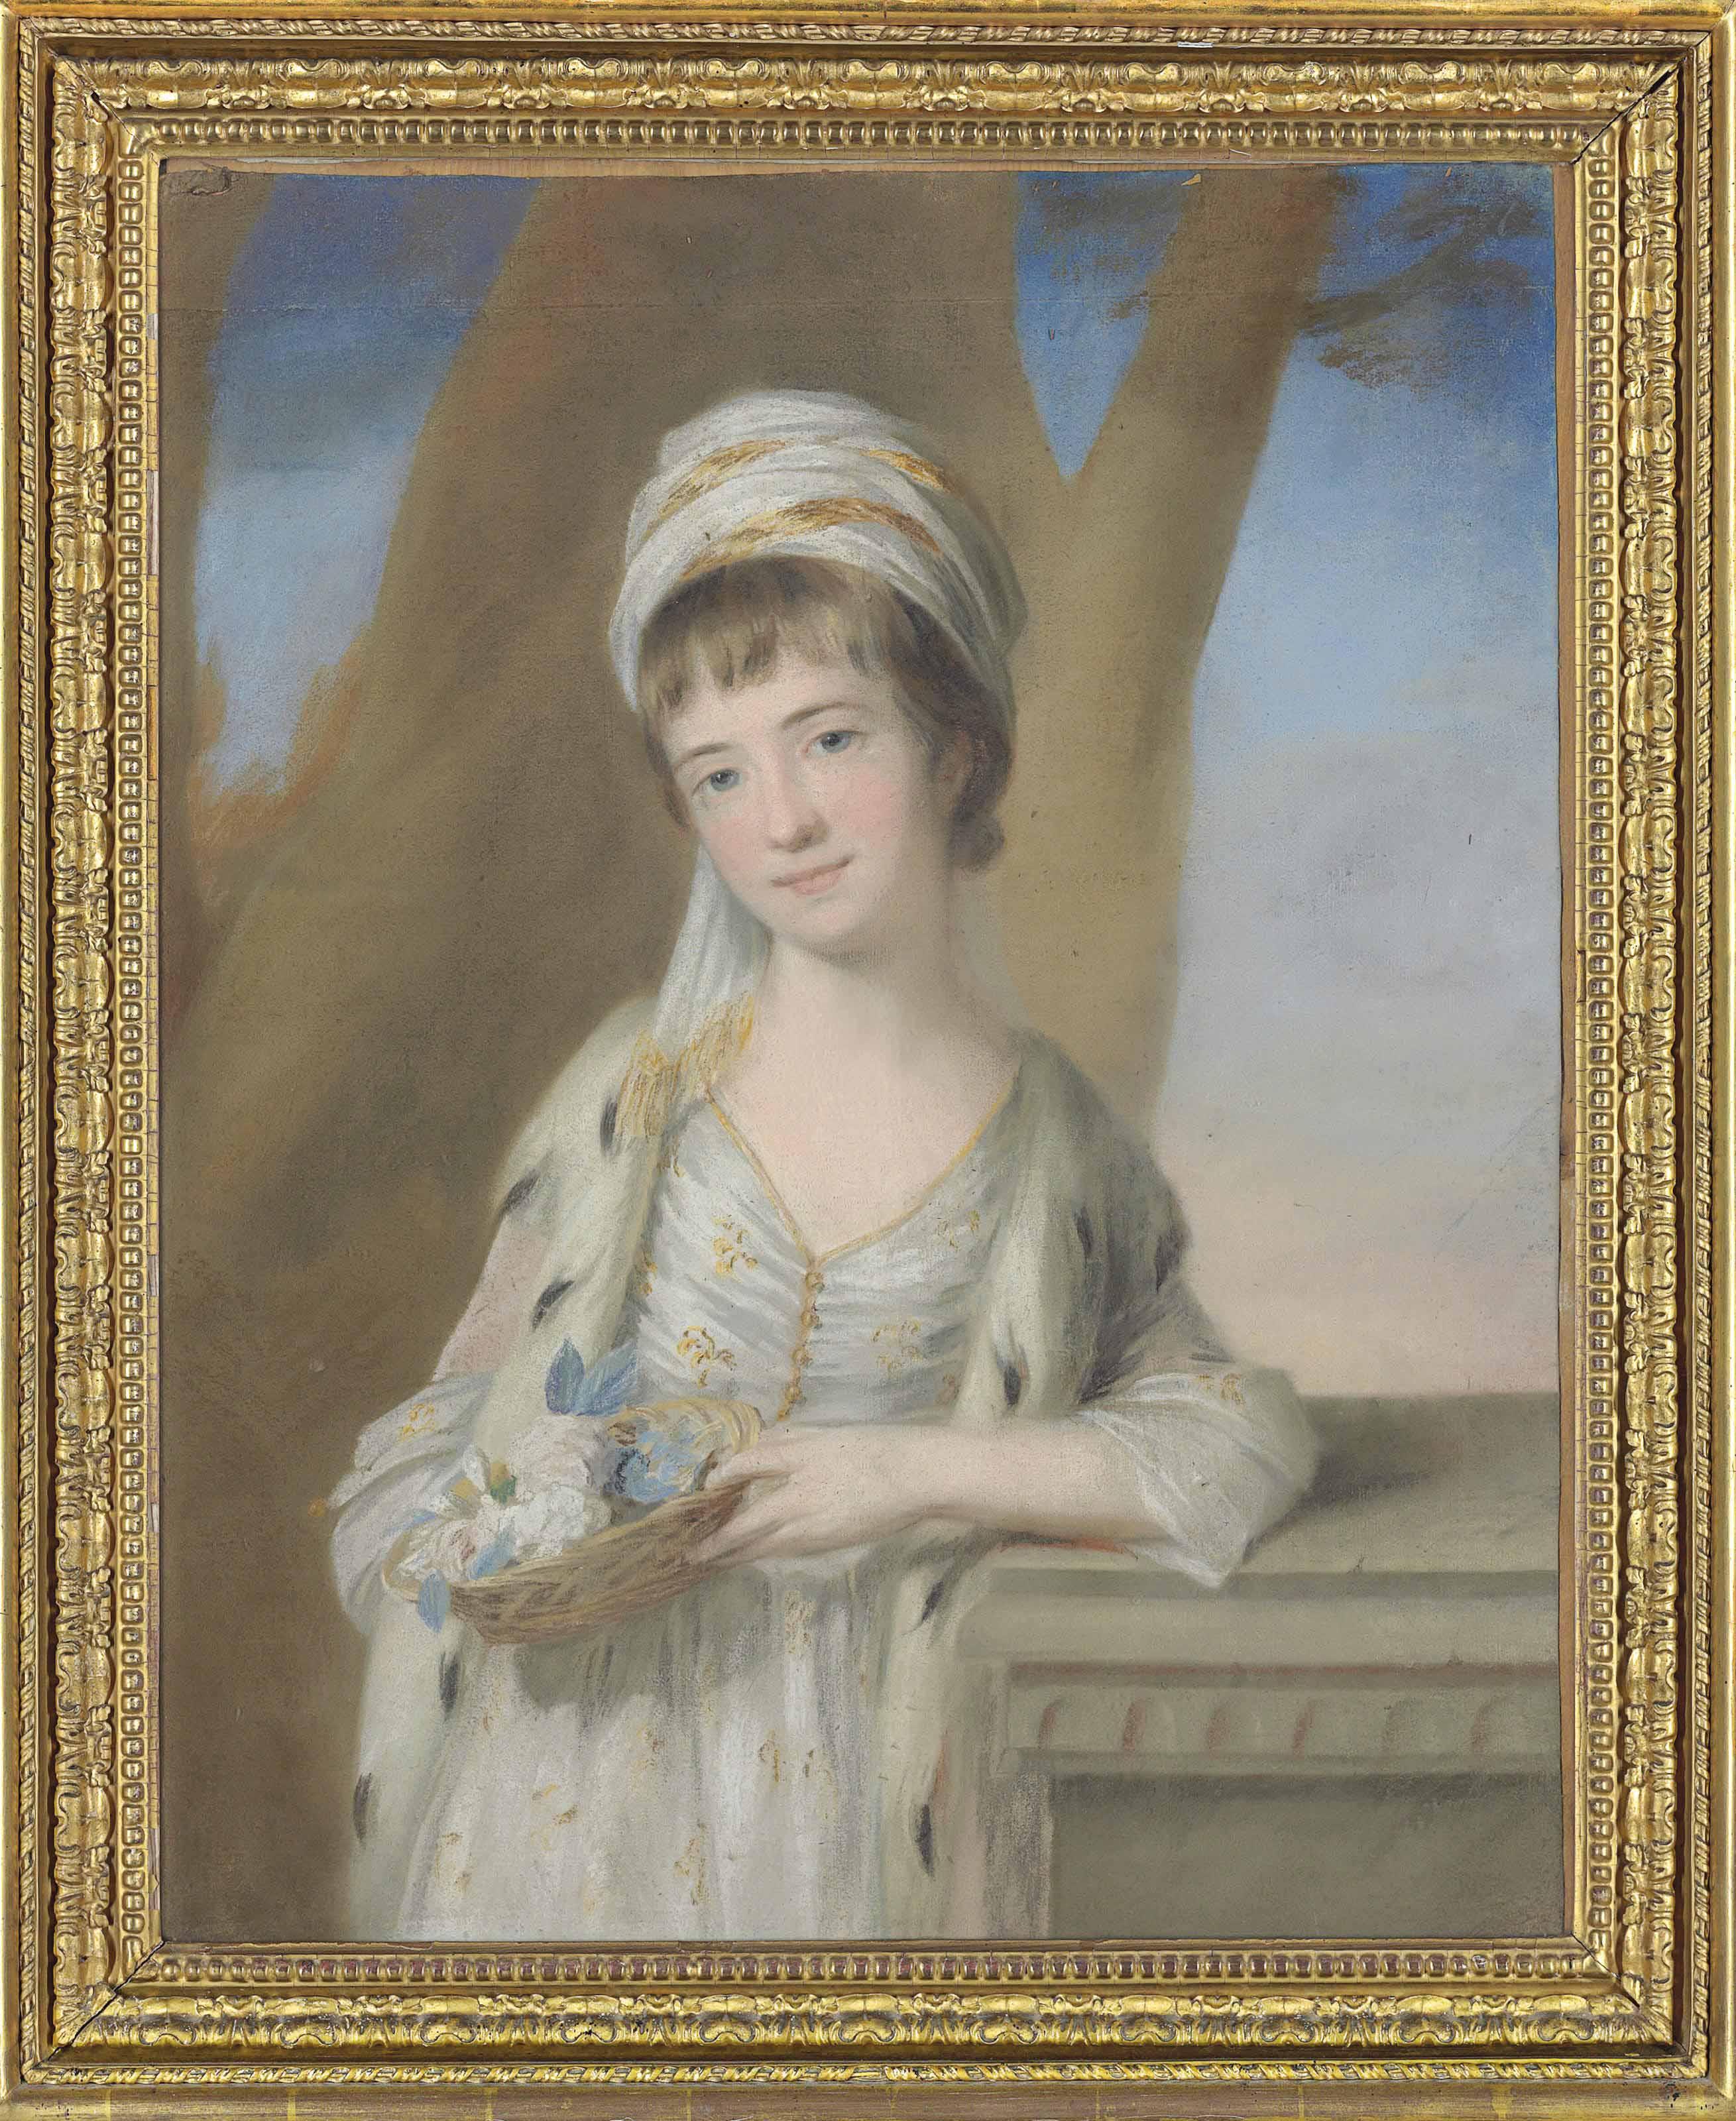 Portrait of Mary Sturt (1759-?), three-quarter-length, standing, holding a basket of flowers